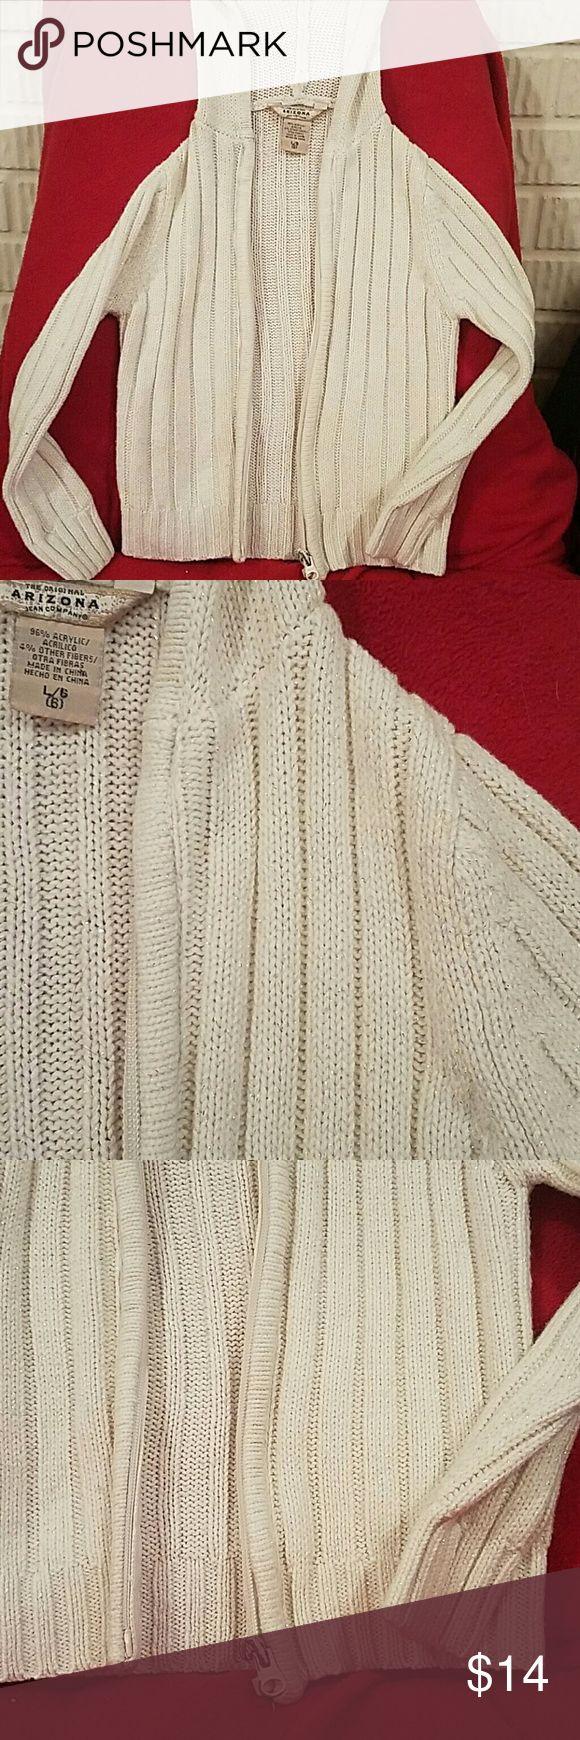 Girls Winter White & Silver zip-up knit sweater Winter White & Silver zip-up knit hooded sweater. Arizona Jean Company Shirts & Tops Sweatshirts & Hoodies